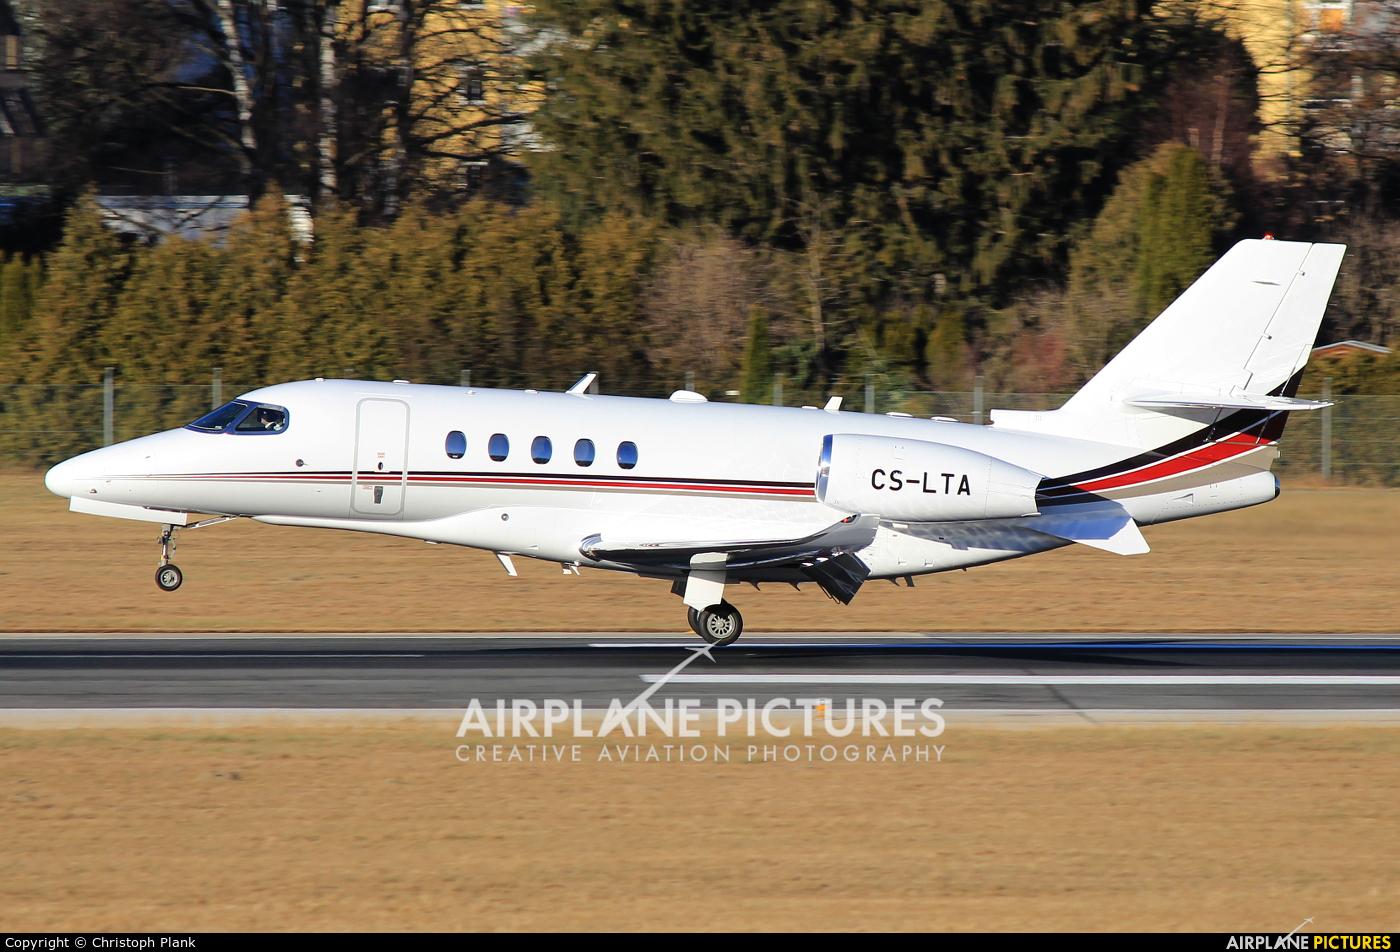 NetJets Europe (Portugal) CS-LTA aircraft at Innsbruck